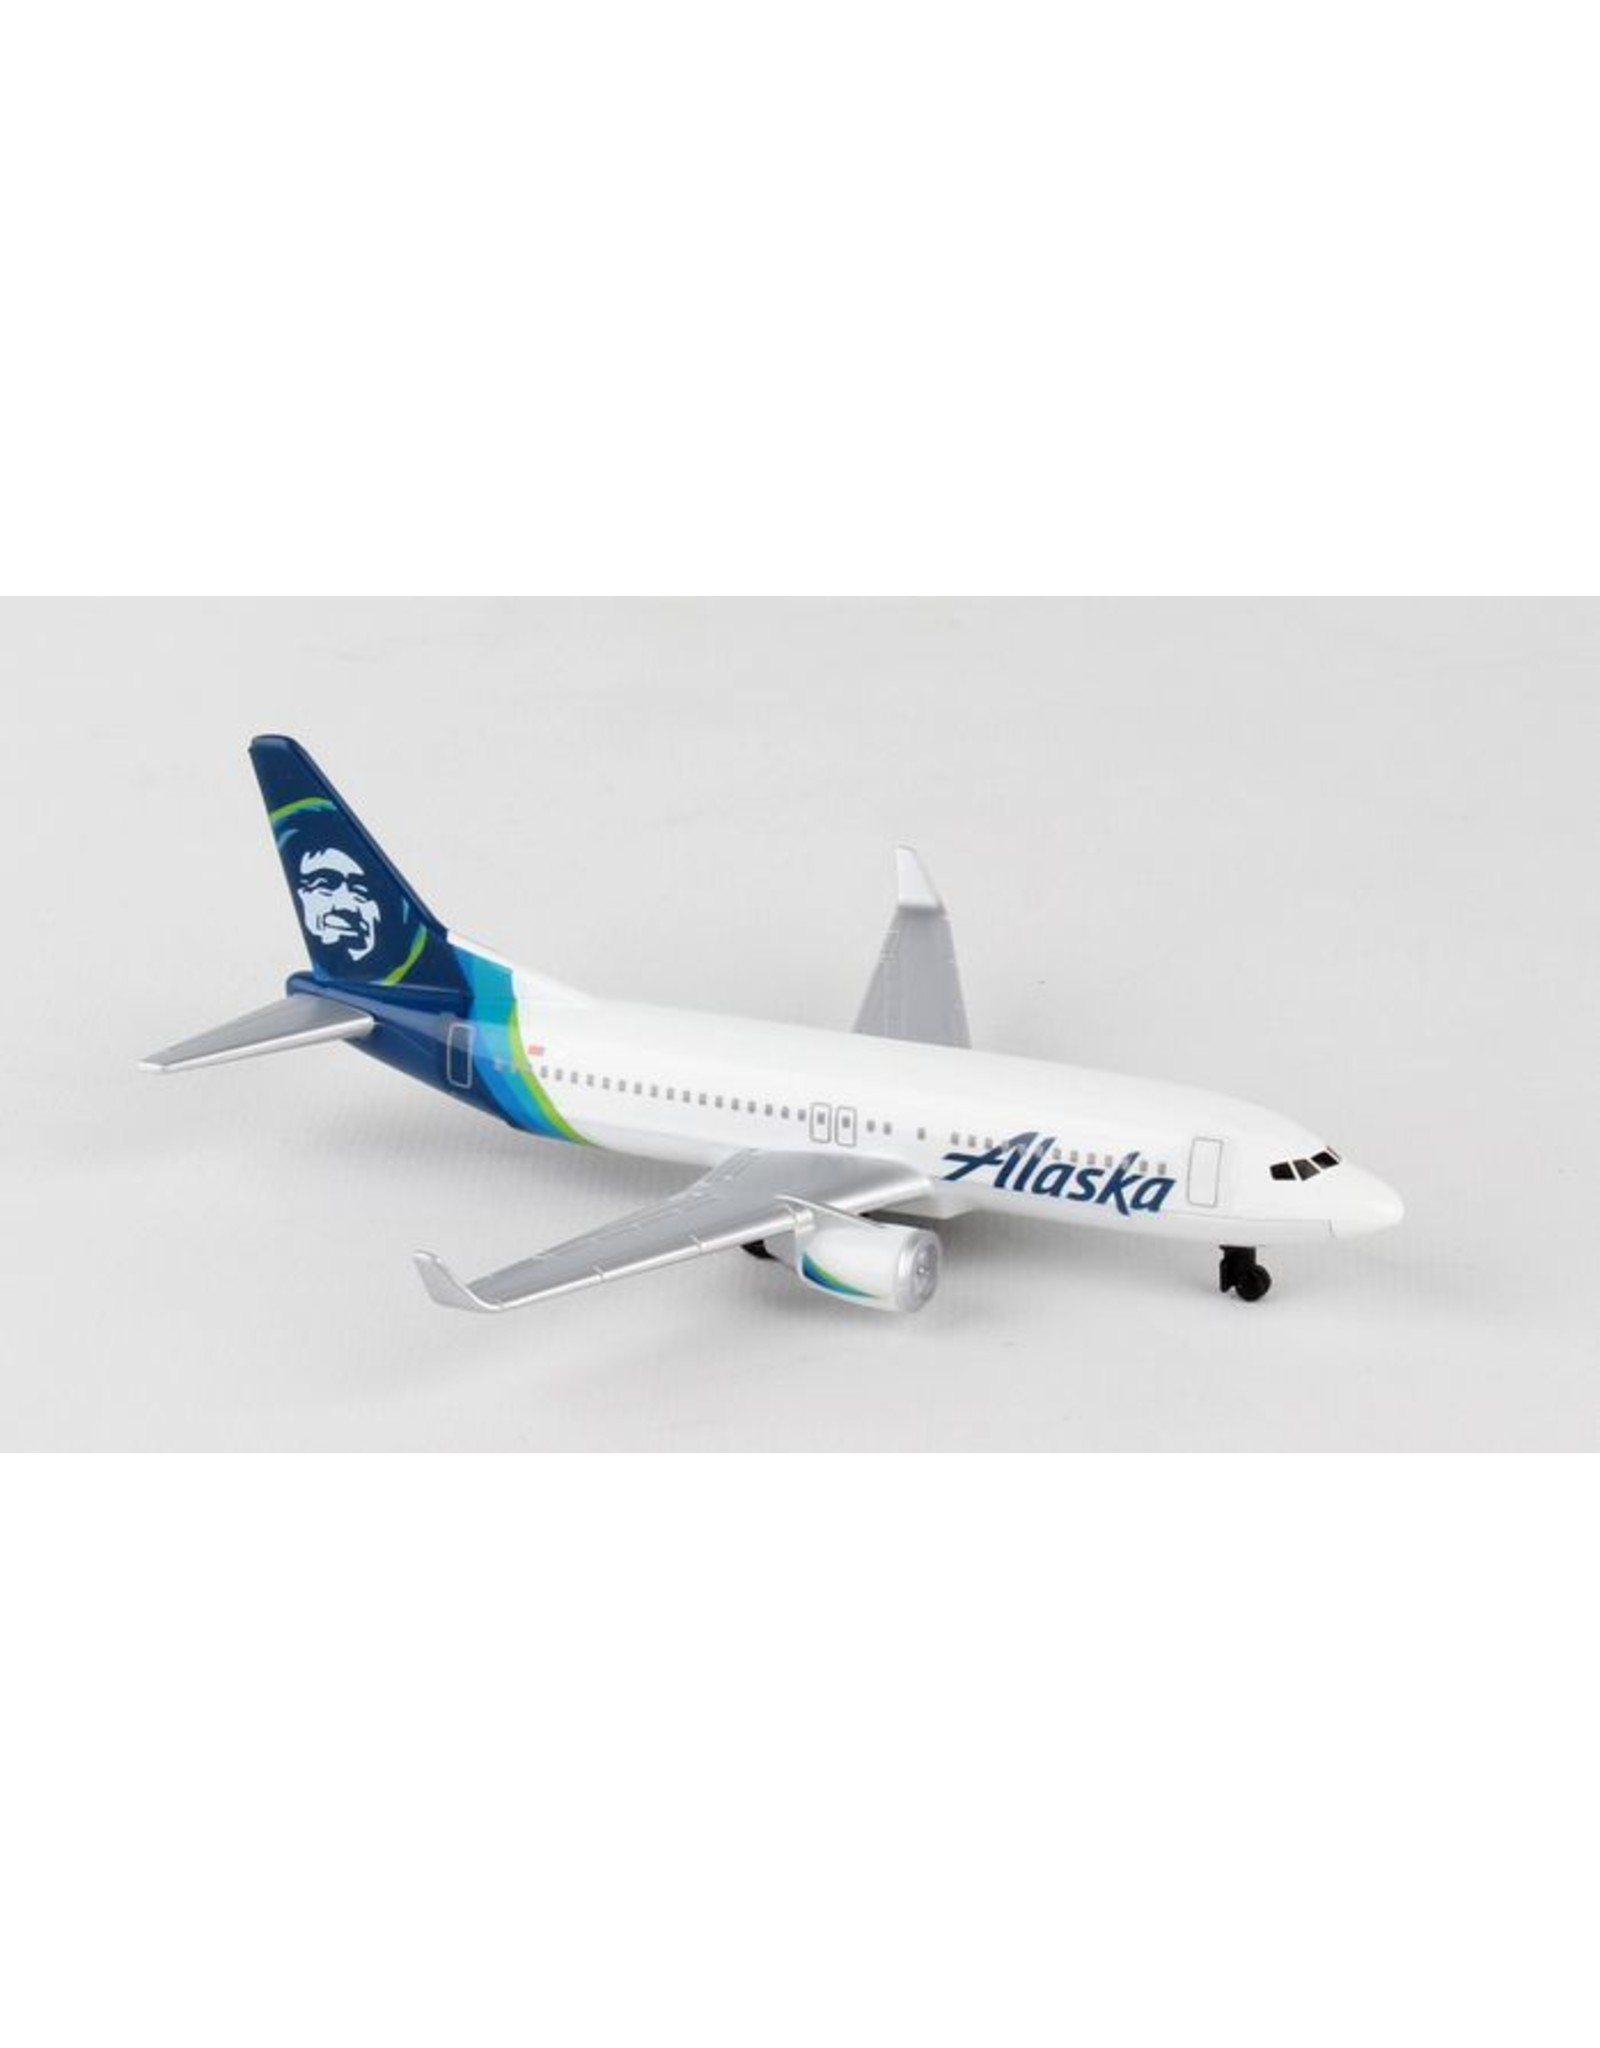 Single Plane Alaska Airlines